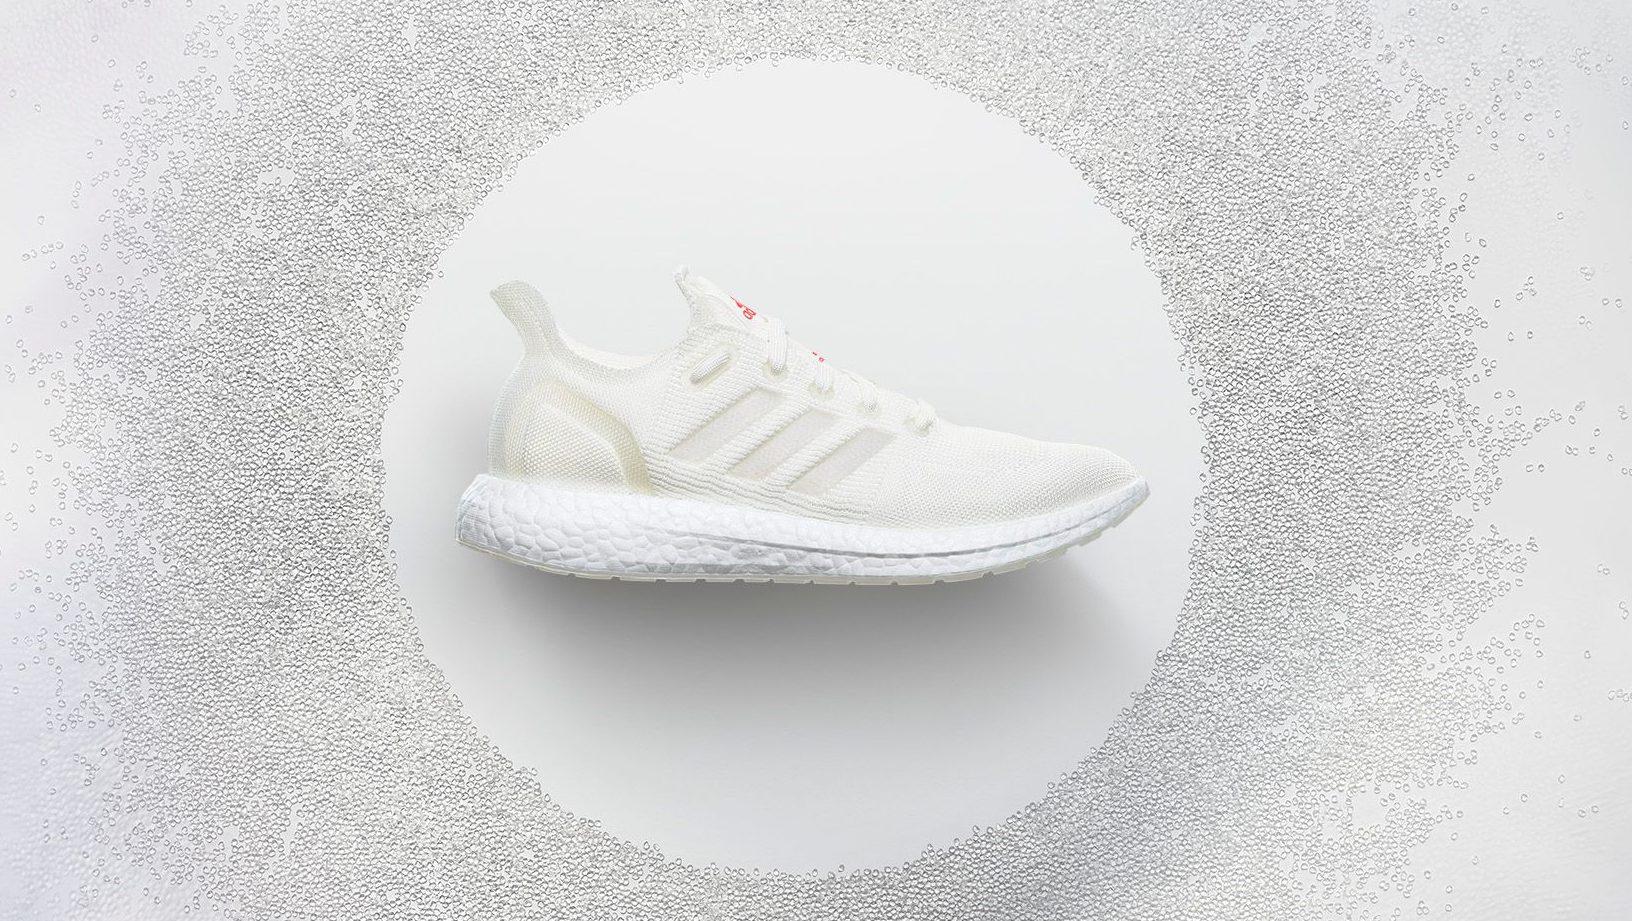 Adidas's Futurecraft.Loop is a zero-waste, sustainable sneaker